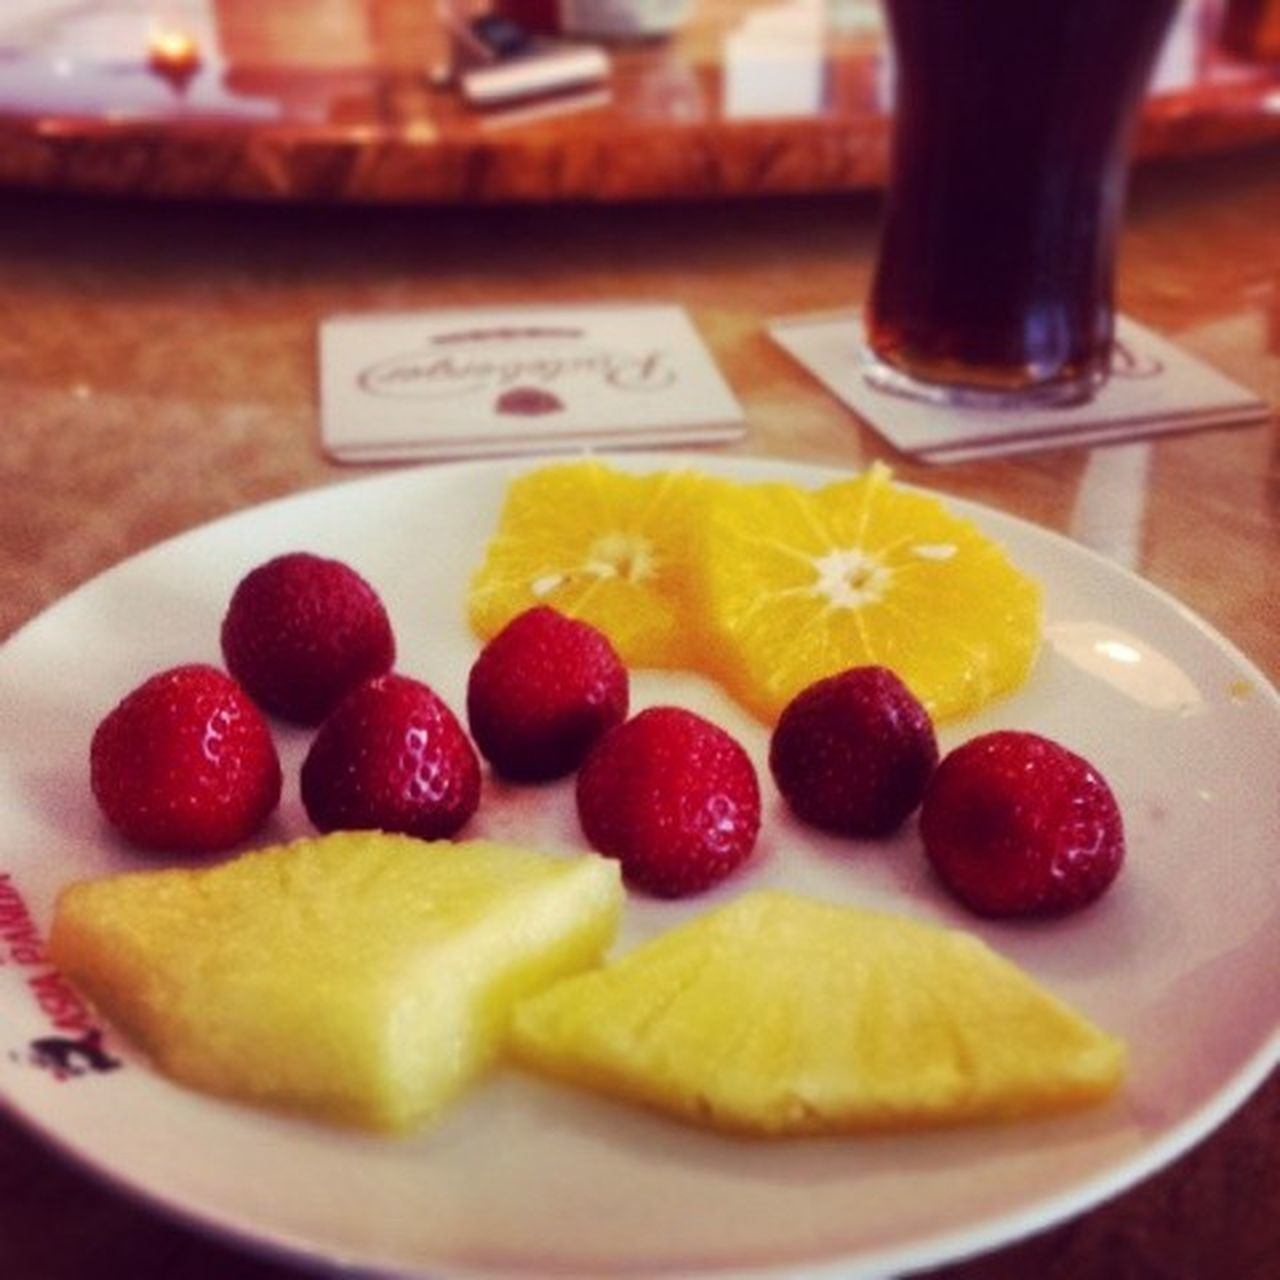 Delicious Strawberry Orange Ananas Family Boyfriend Loveuall